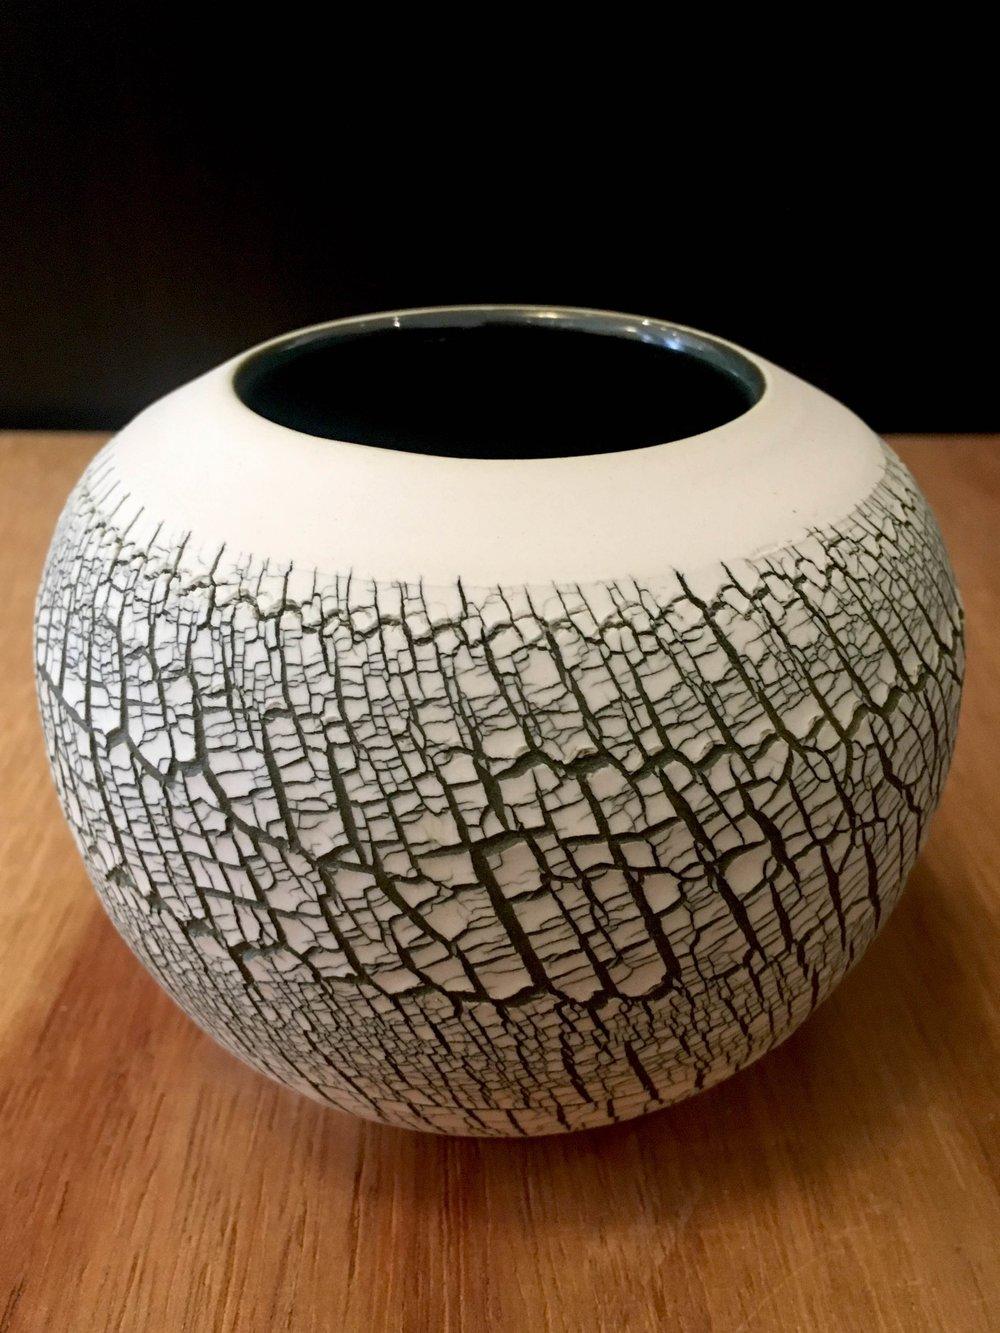 "Small wheel-thrown porcelain open sphere, 3 1/2"" x 4 1/2"" diameter, $55"